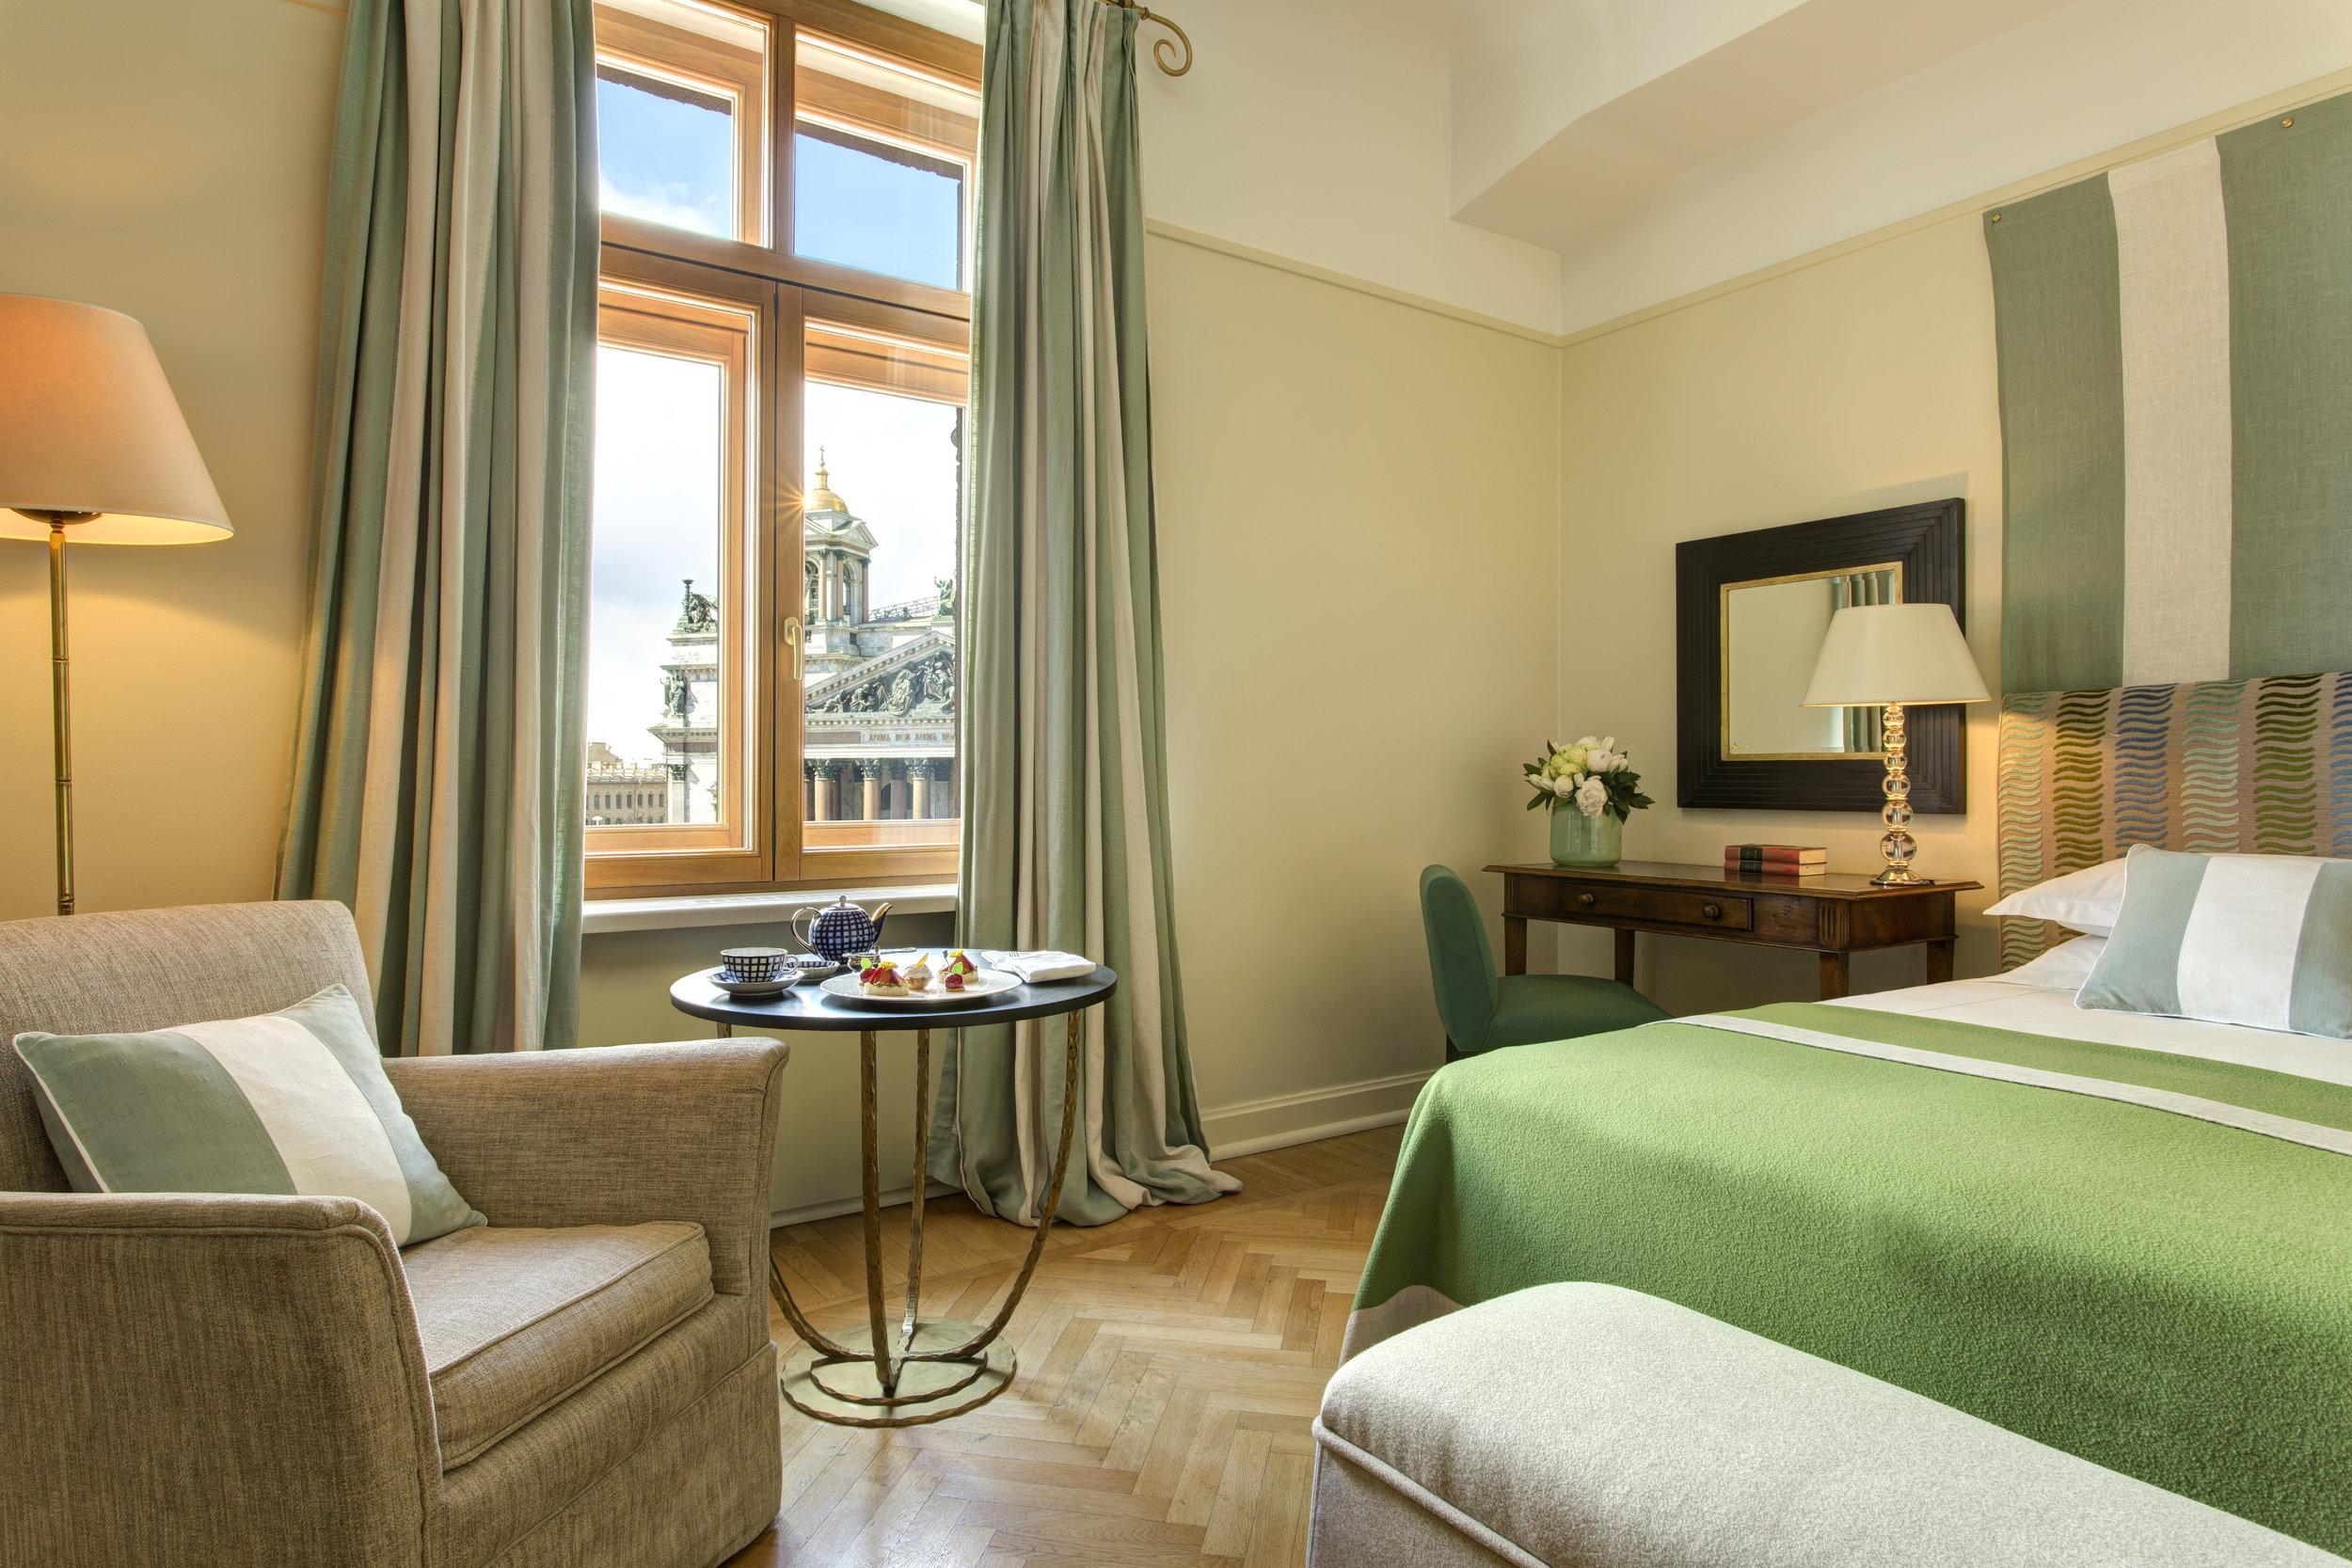 5 RFH Hotel Astoria - Superior Deluxe Room 7263.JPG